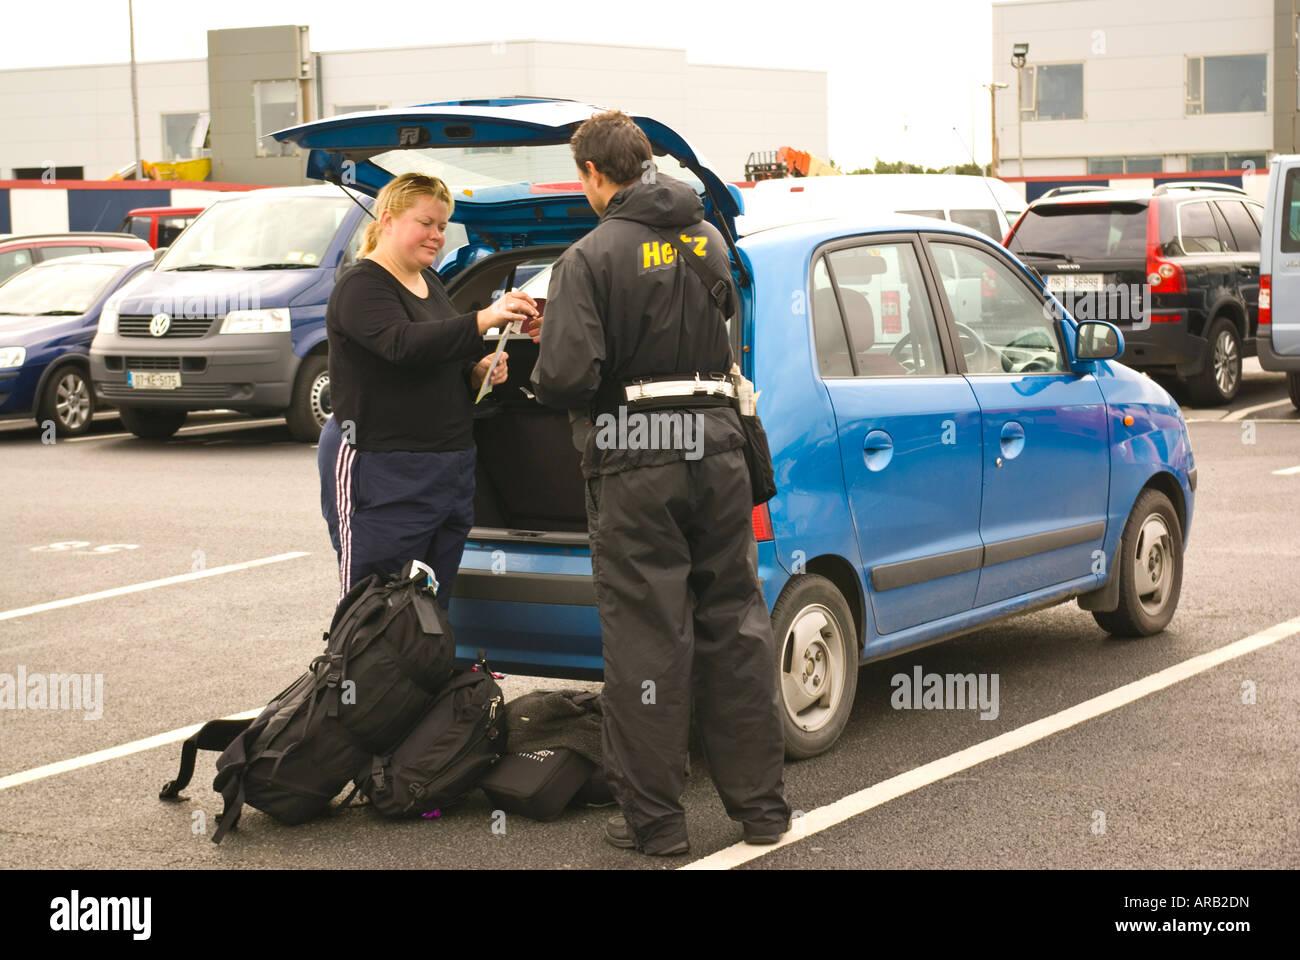 Car Hire Ireland: Car Hire Drop Off, Hertz, Dublin Airport, Ireland Stock